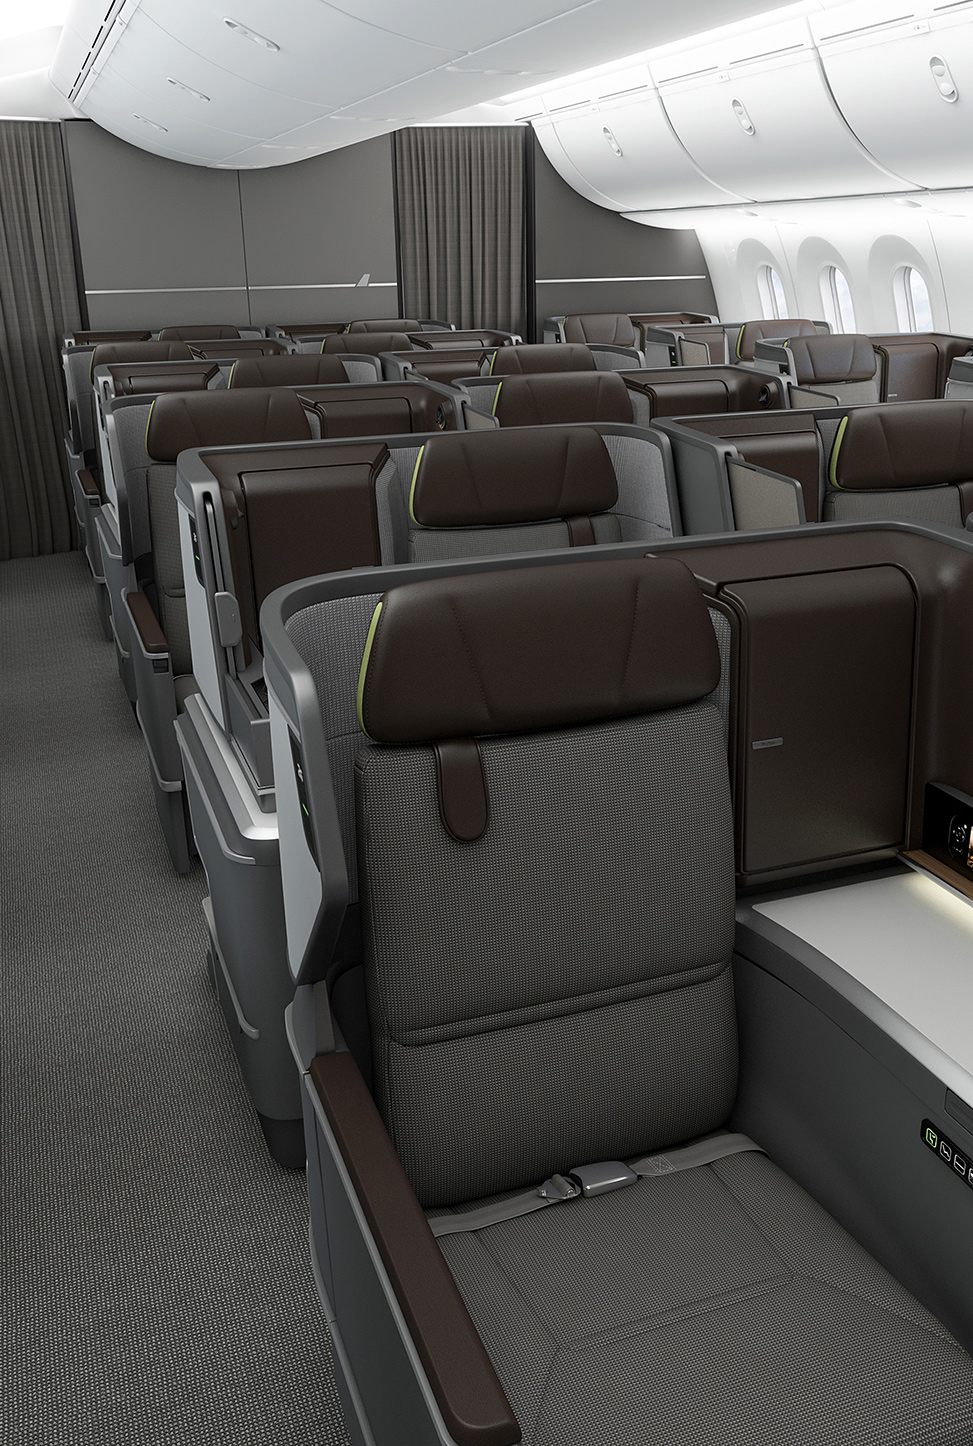 eva air seats